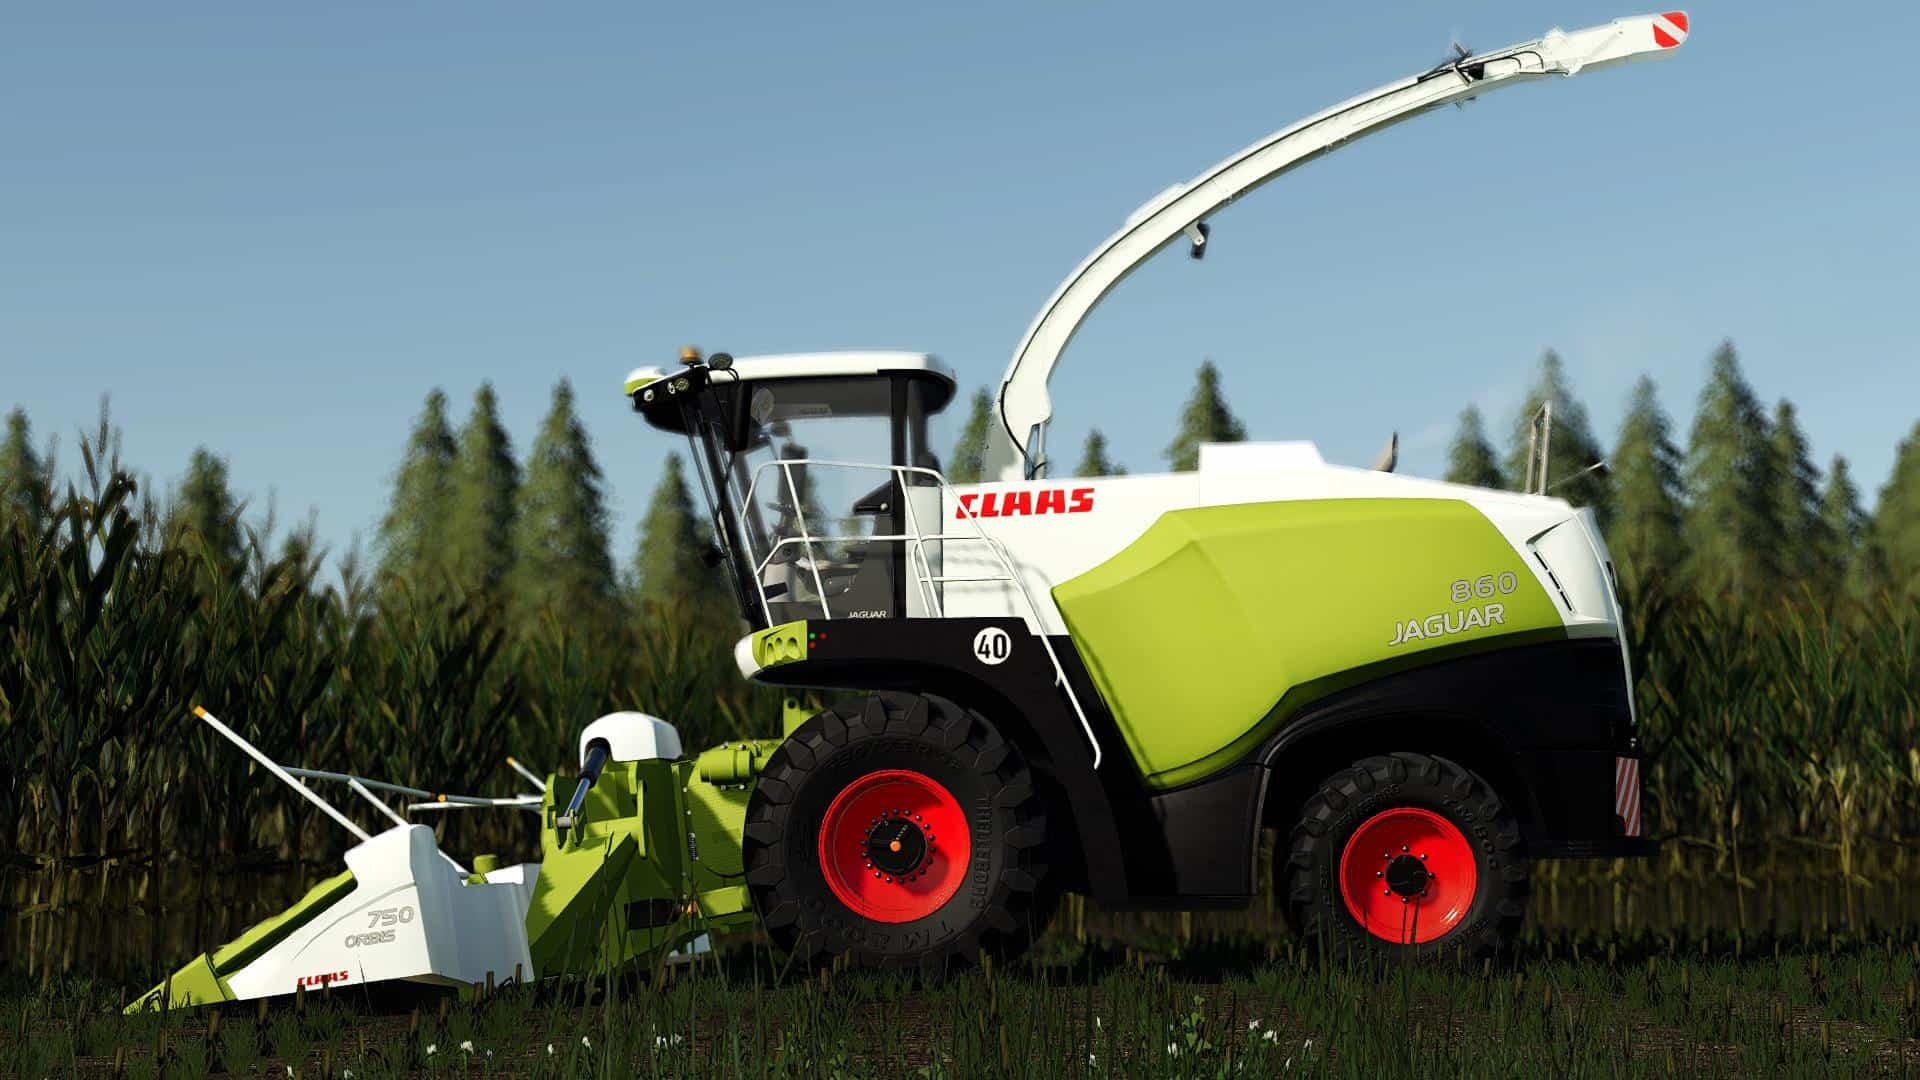 Claas Jaguar 800 Pack v1 0 0 5 Mod - Farming Simulator 19